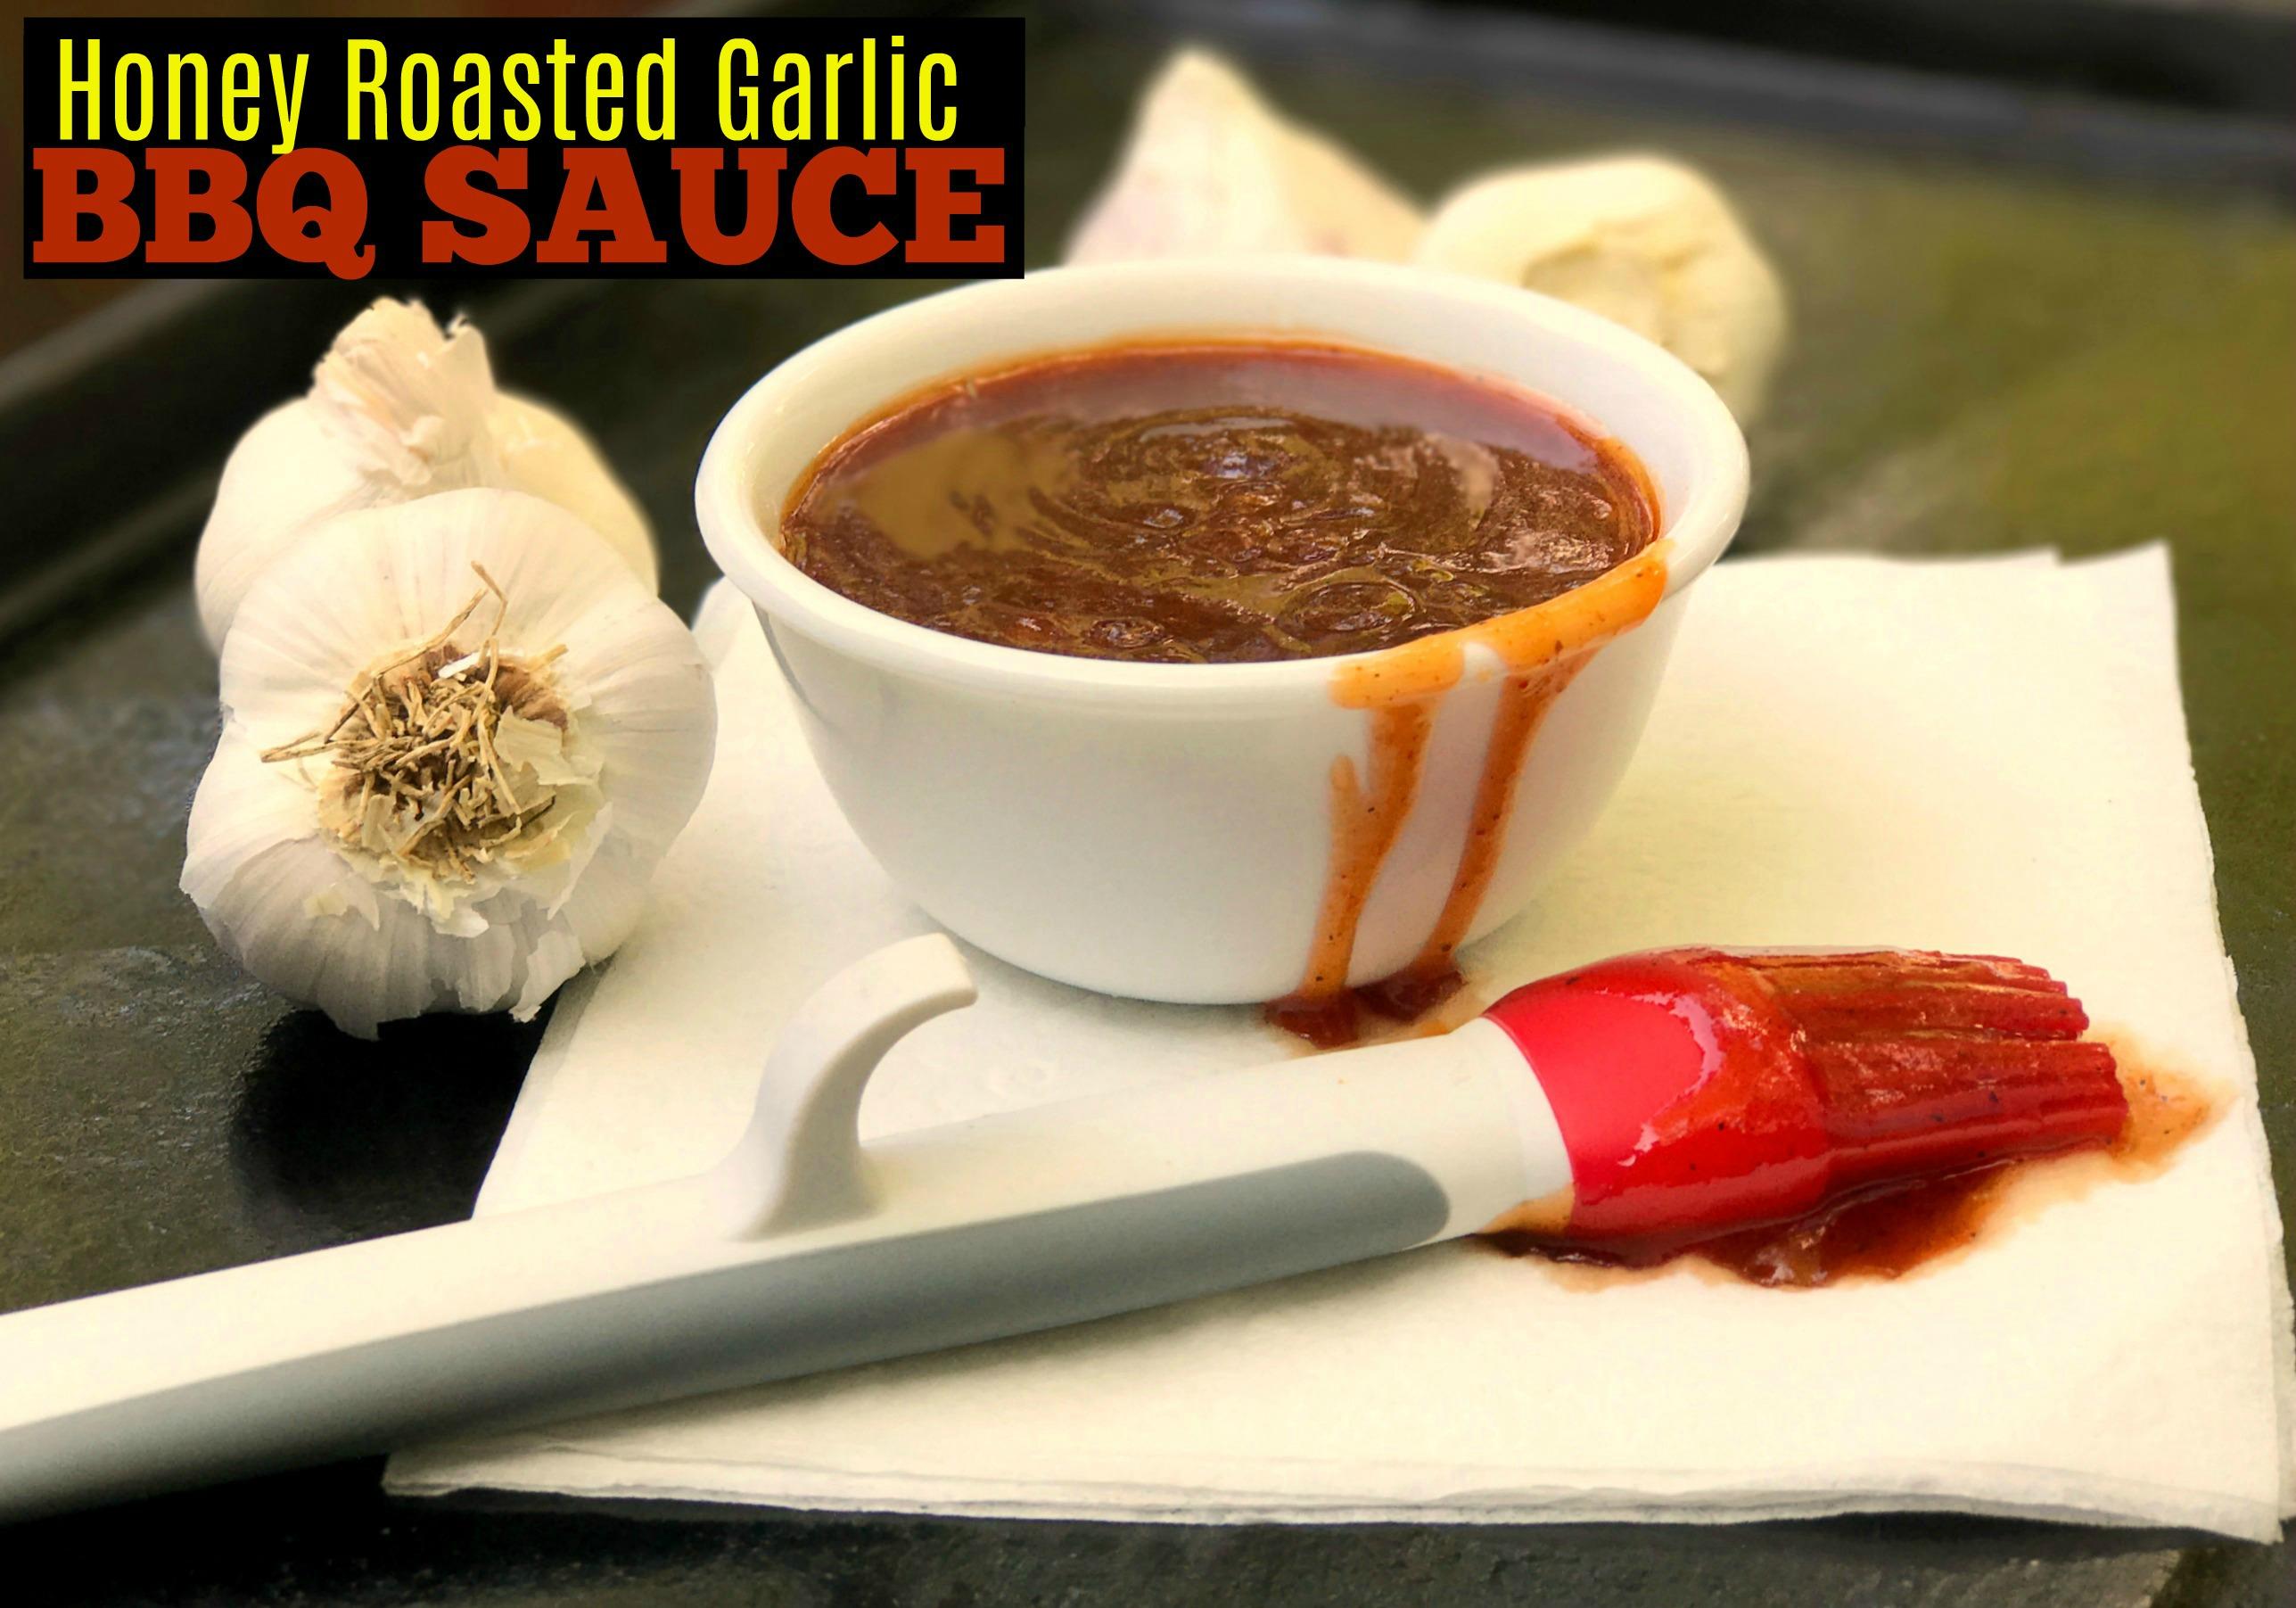 Honey Roasted Garlic BBQ Sauce